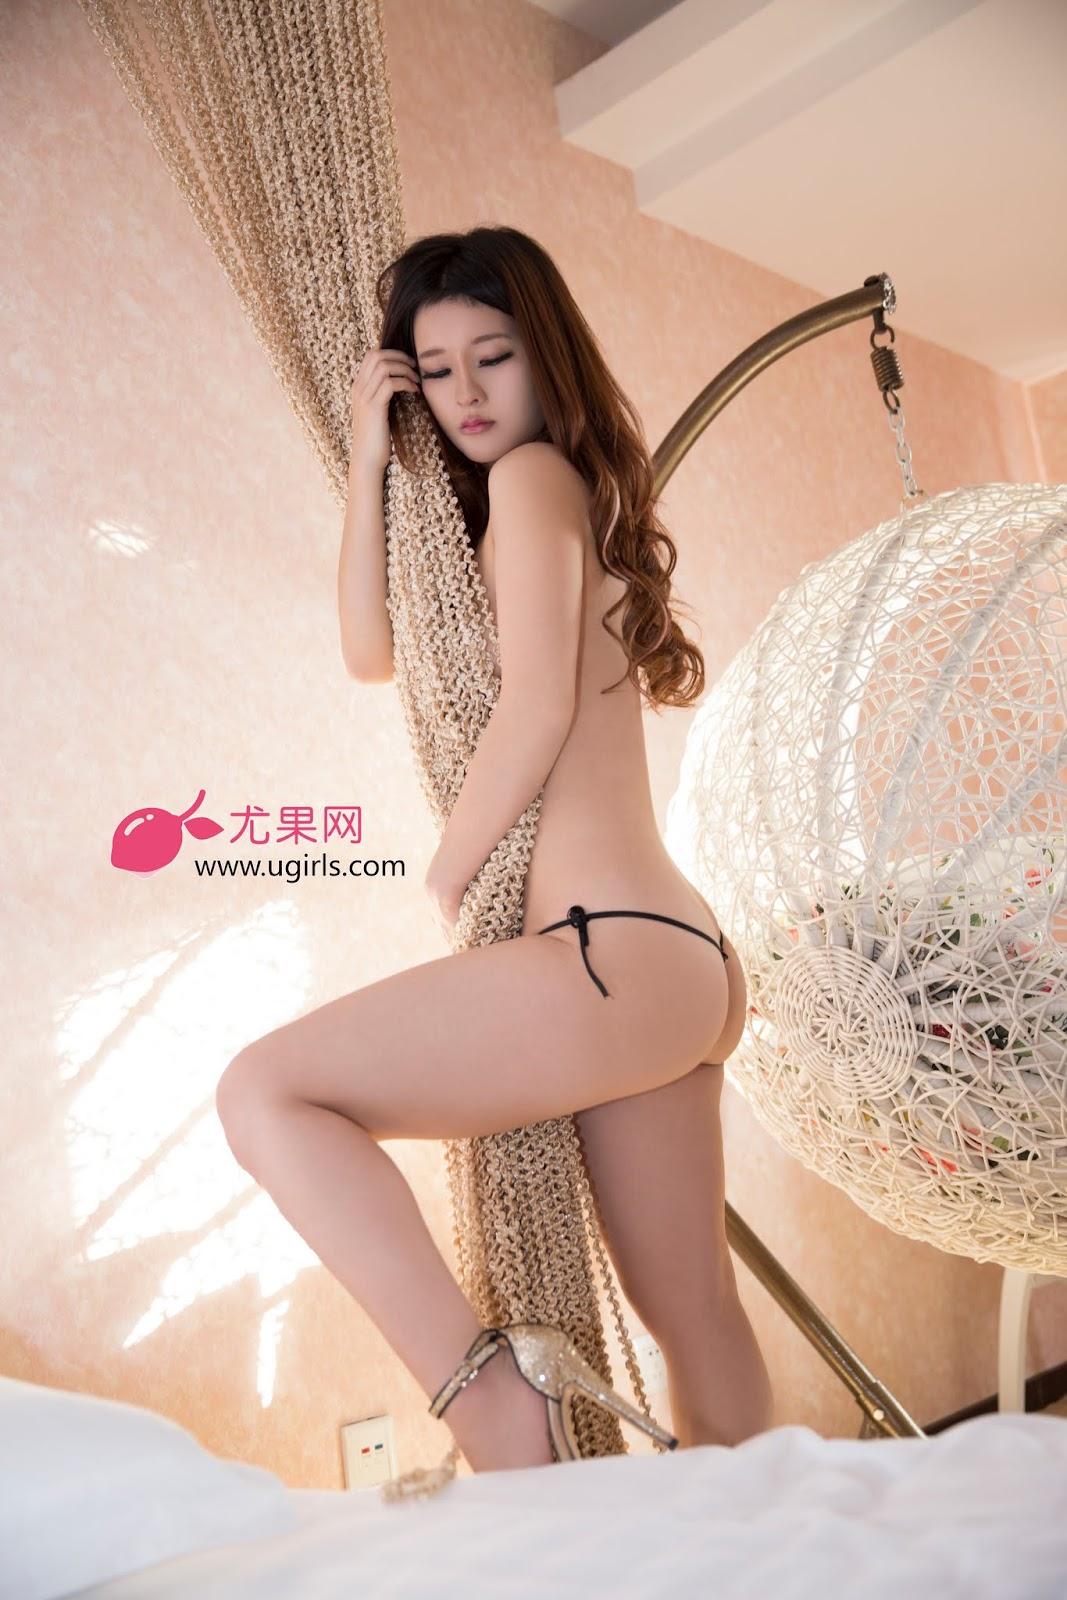 A14A6214 - Hot Photo UGIRLS NO.5 Nude Girl